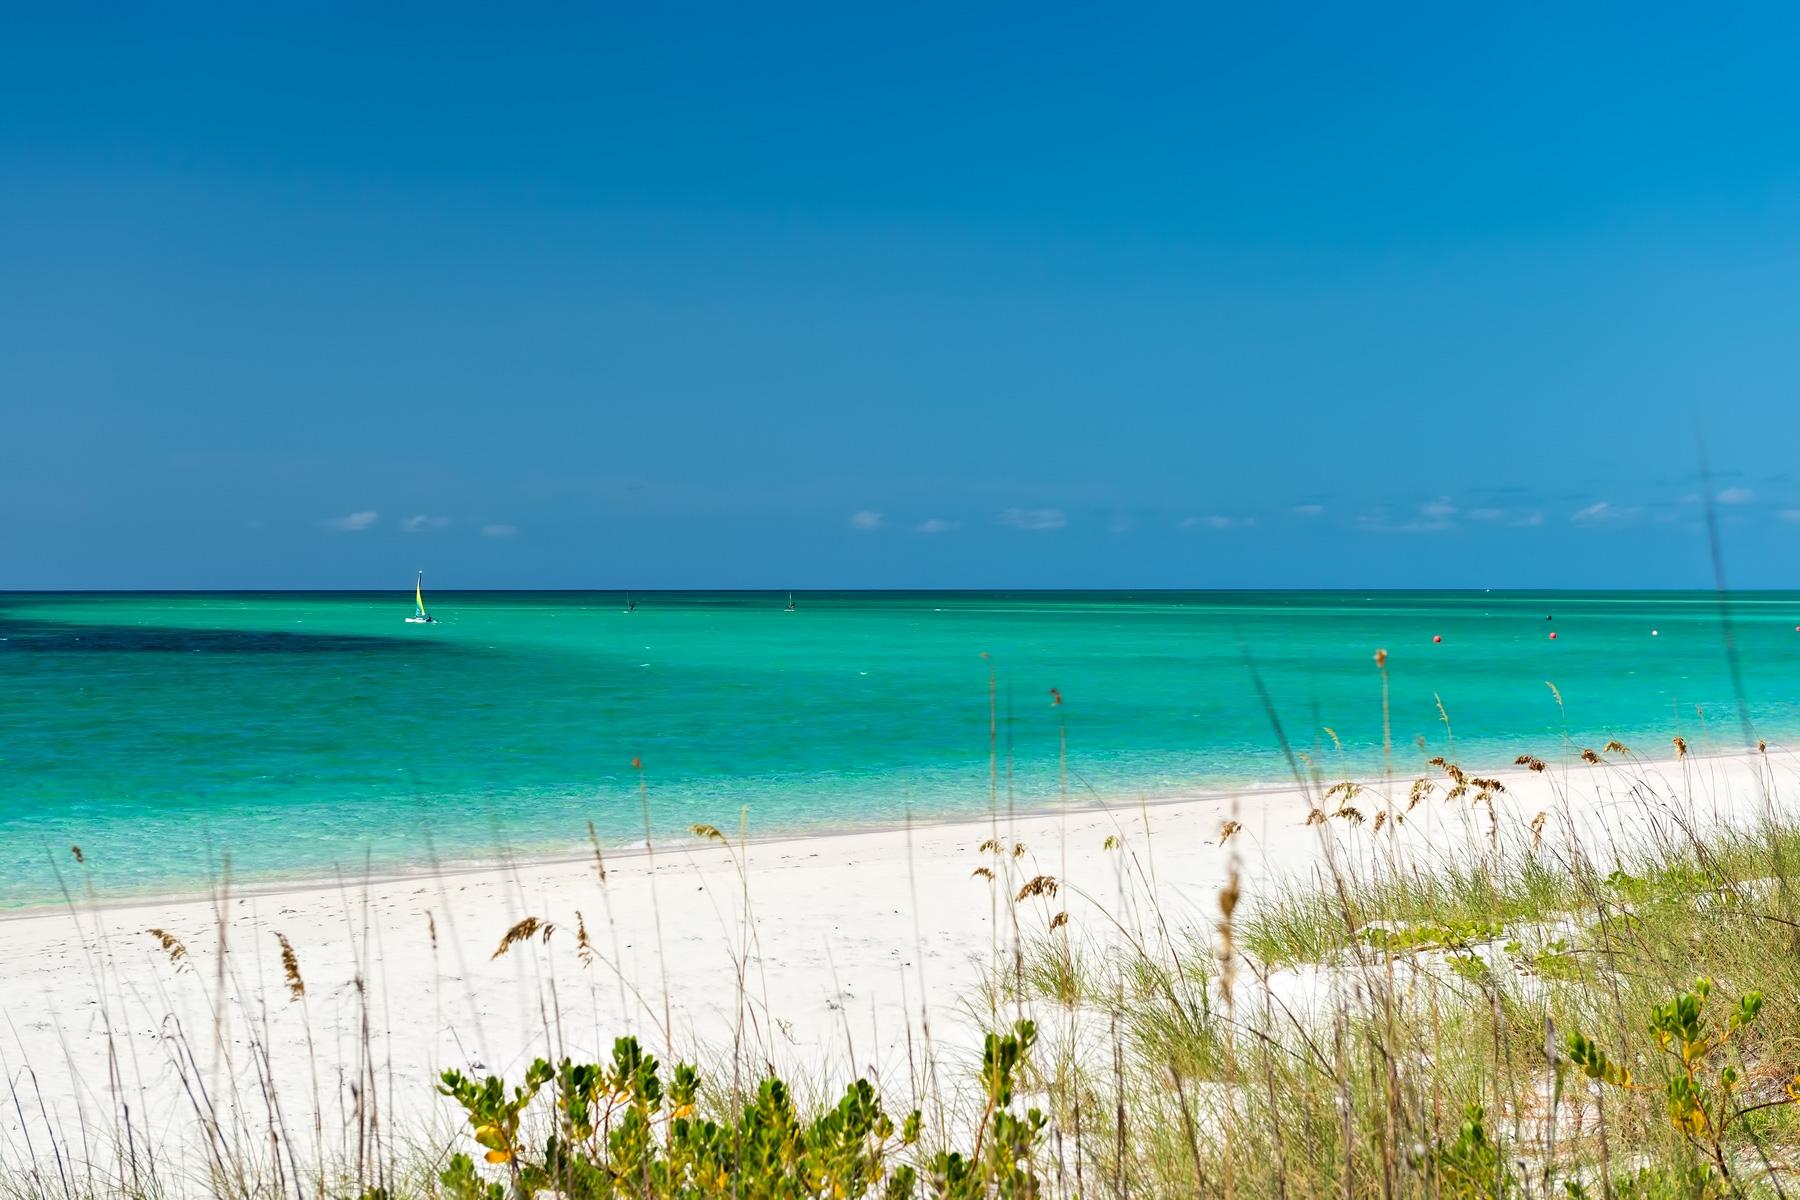 Luxury Island Villa 1101 - Parrot Cay, Turks and Caicos Islands